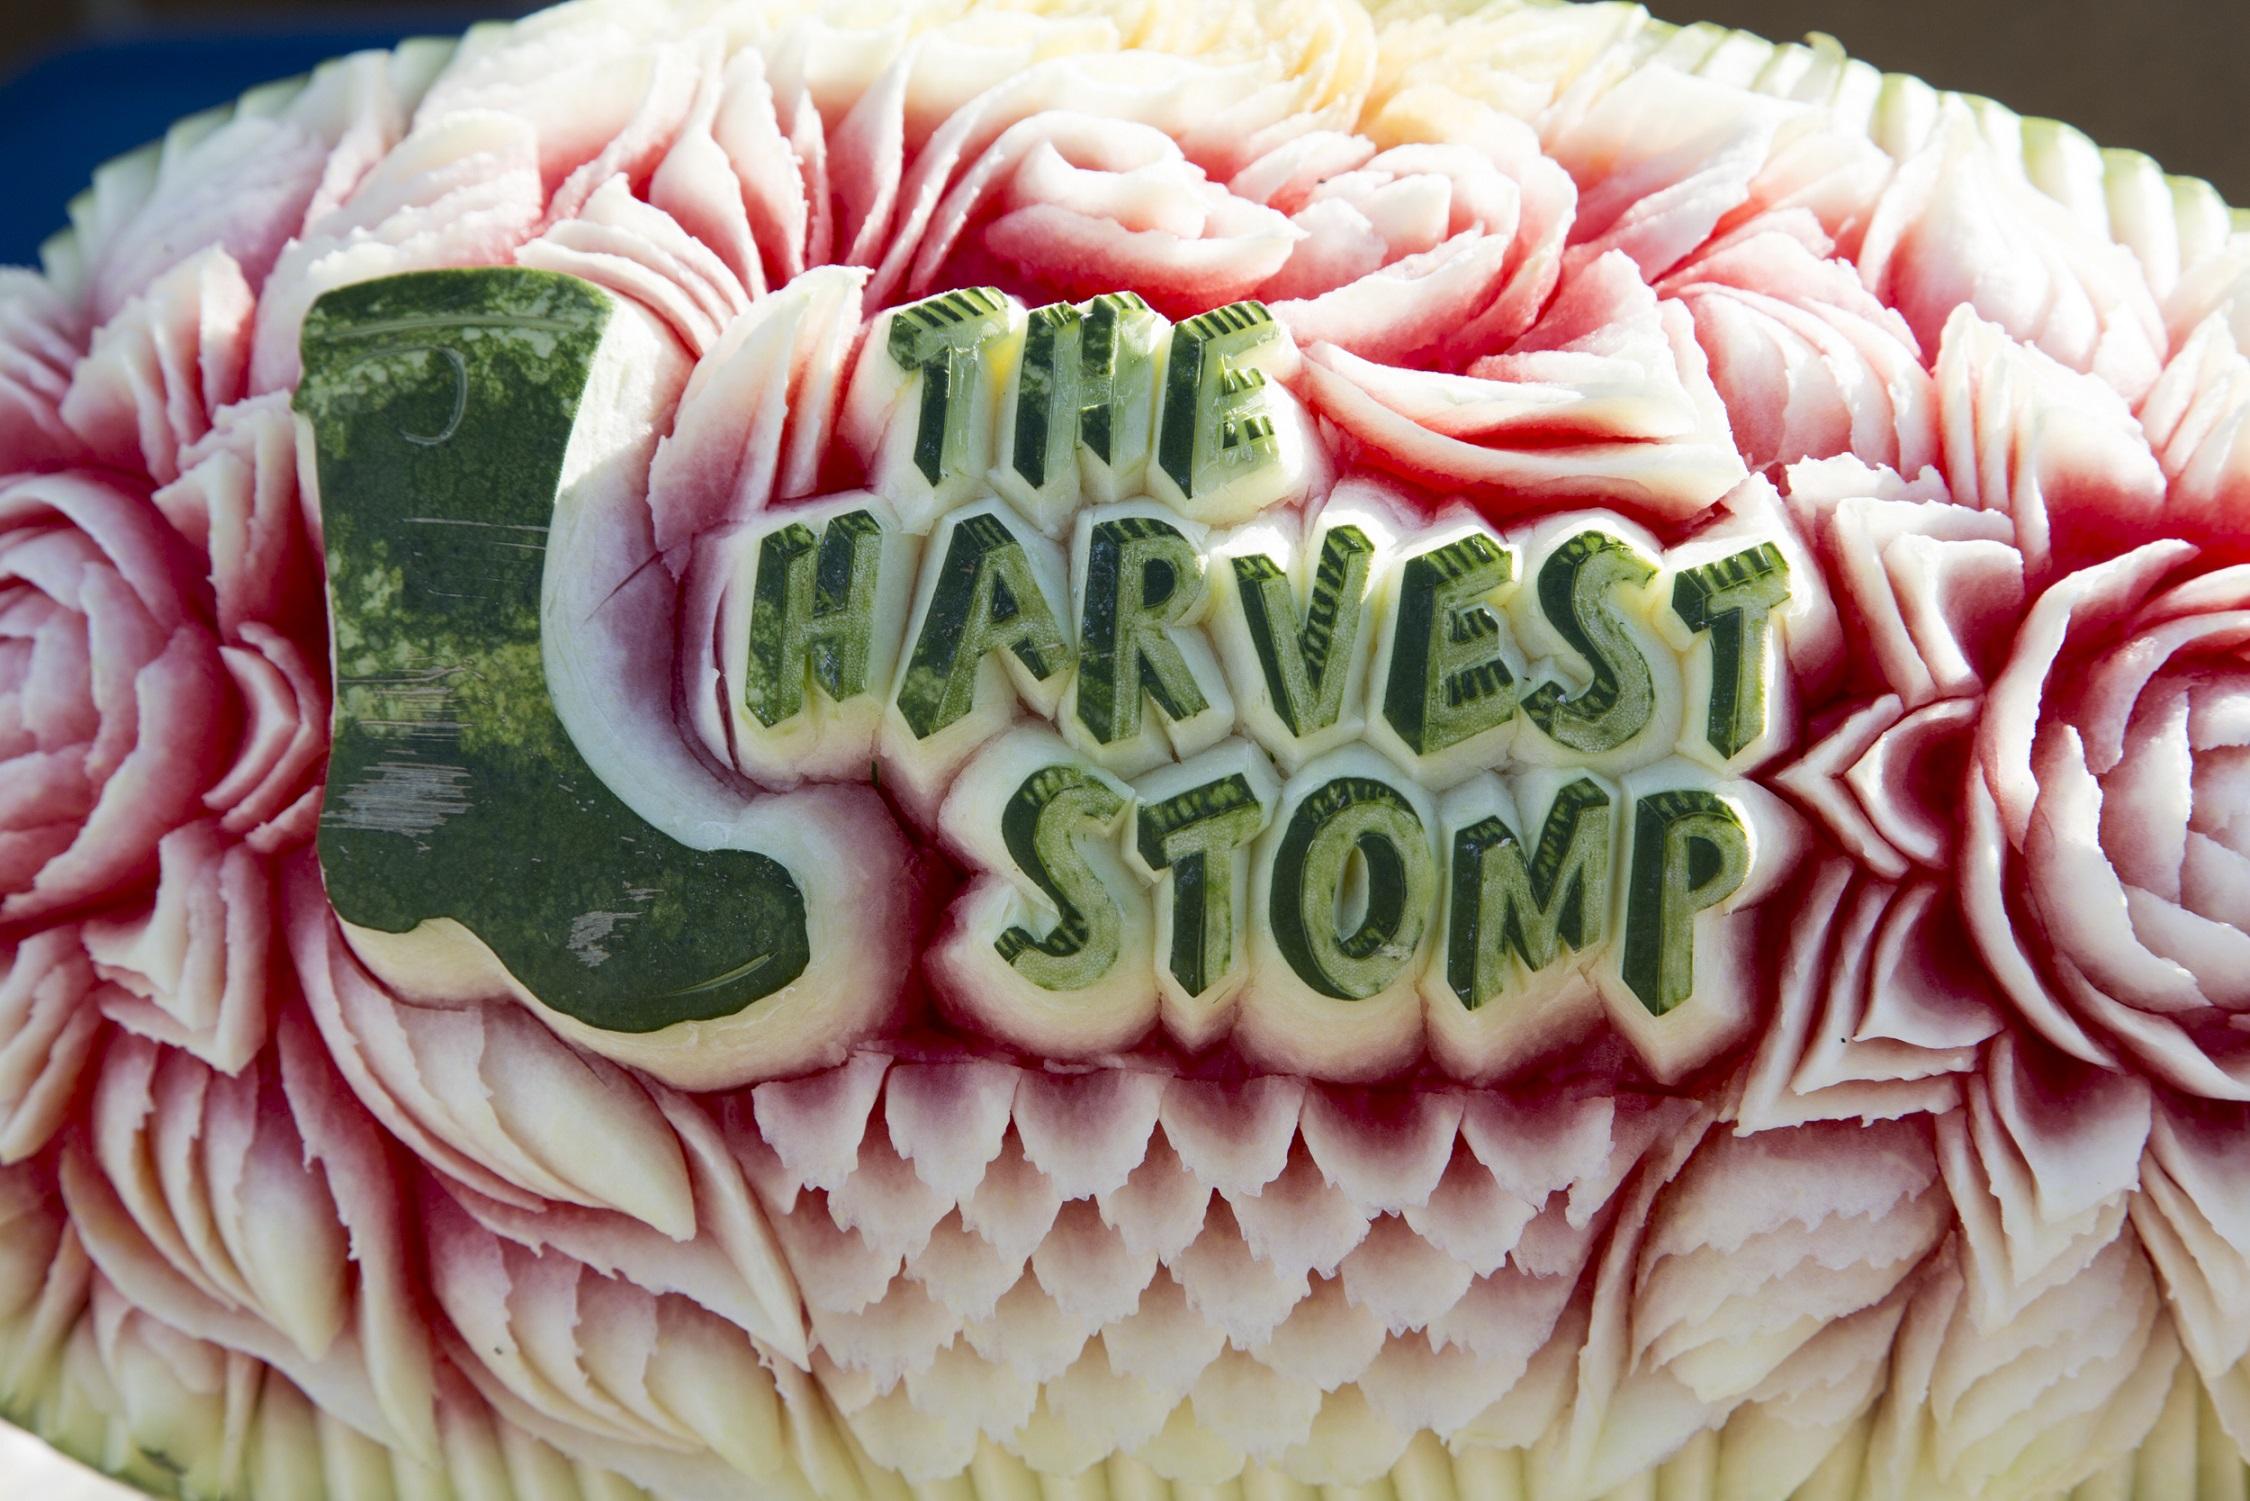 Groundwork London The Harvest Stomp 25.09.16 Queen Elizabeth Olympic Park